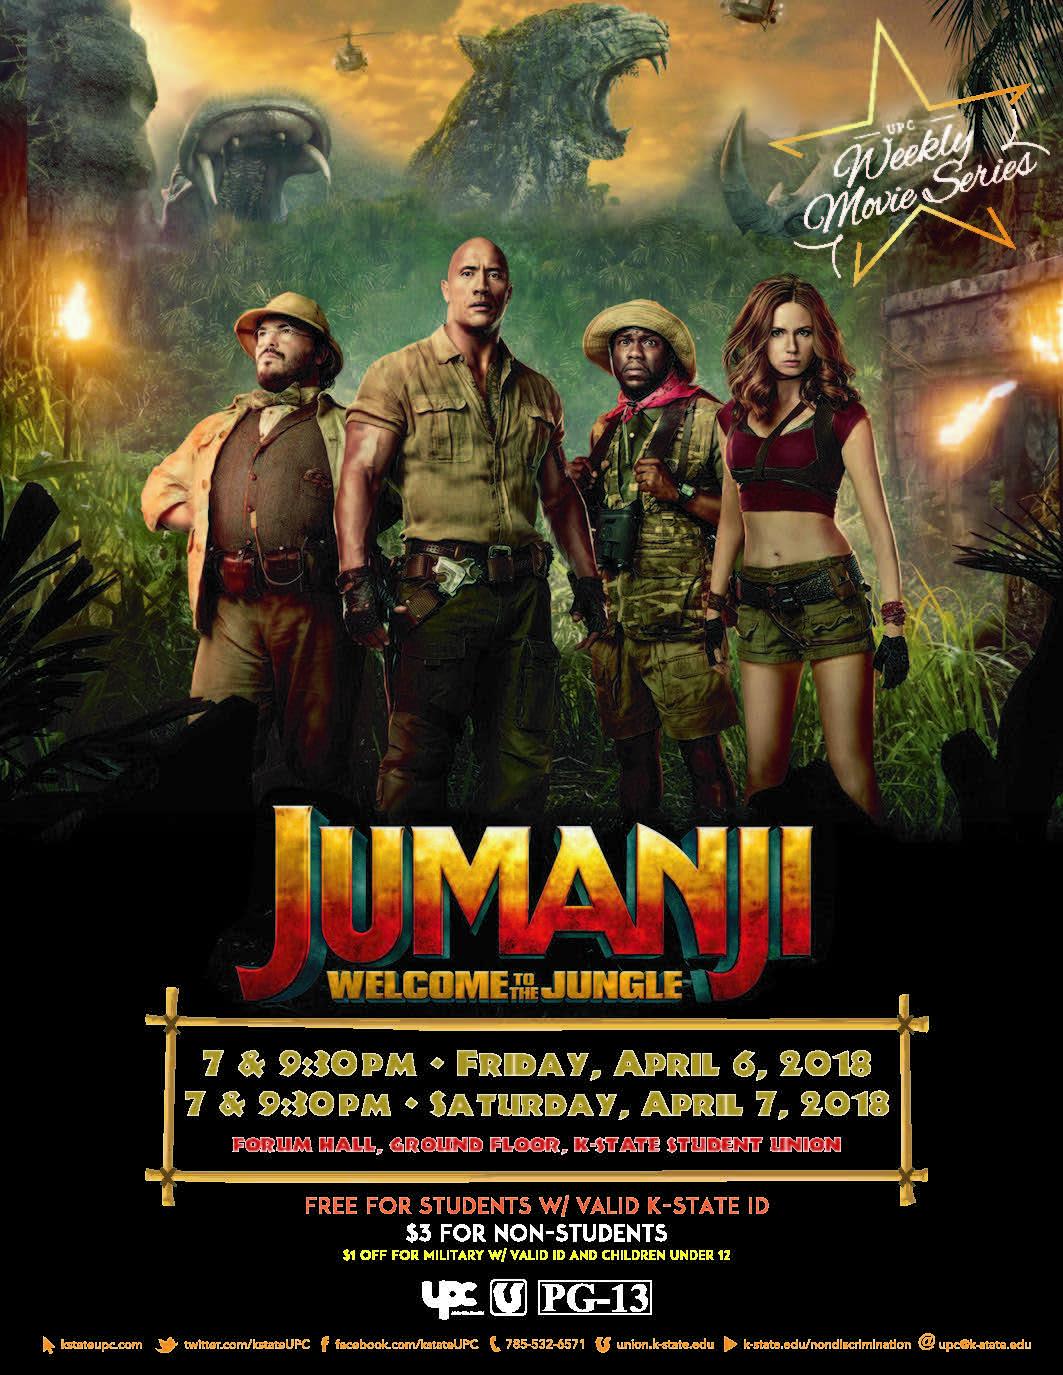 Film jumanji welcome to the jungle pg 13 k state student union film jumanji welcome to the jungle pg 13 stopboris Gallery